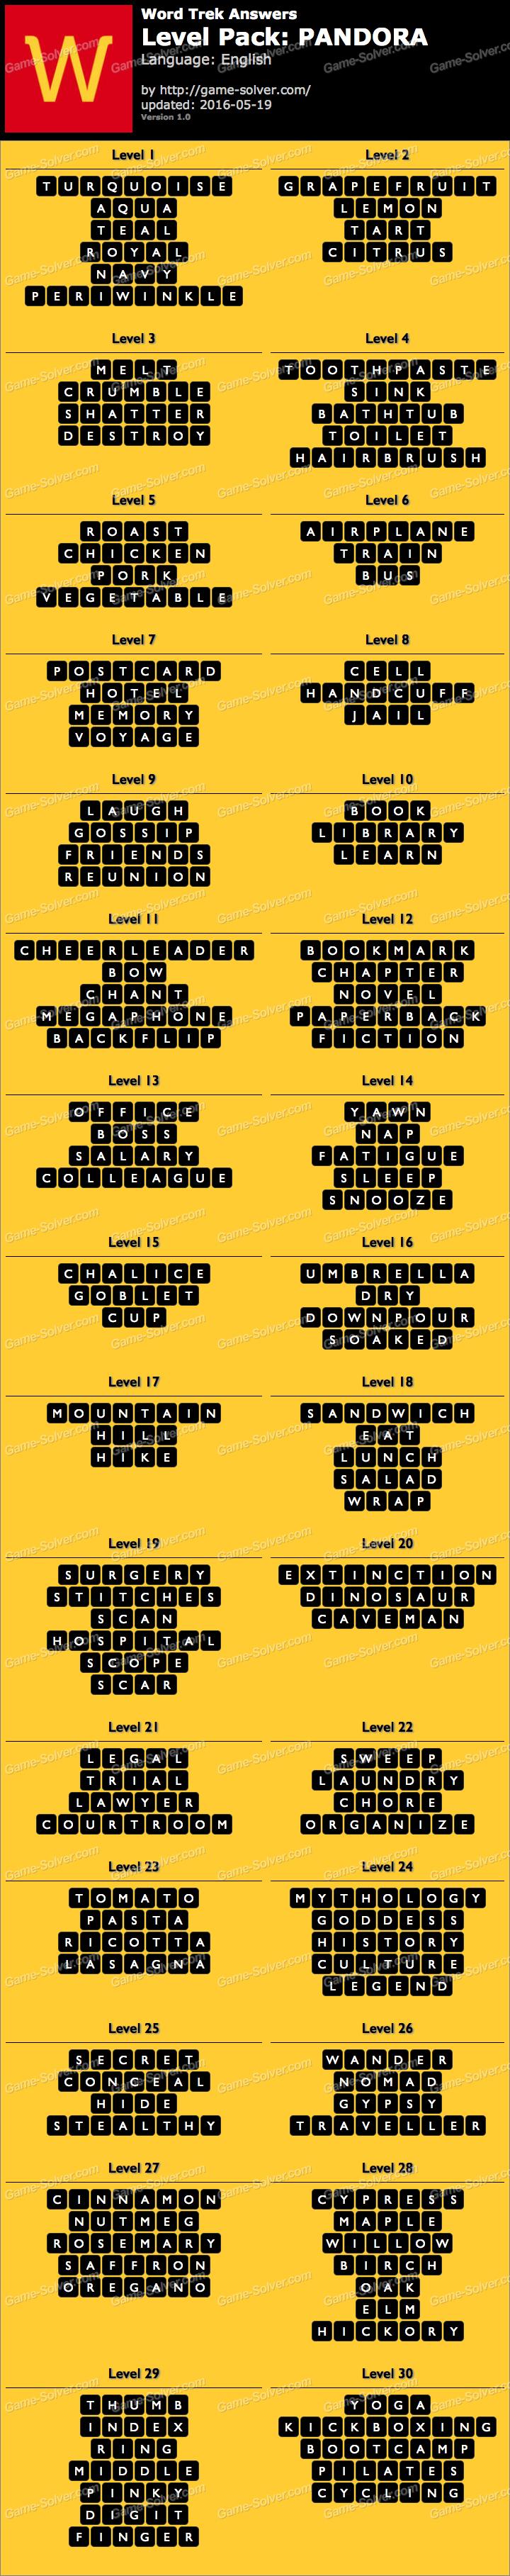 Word Trek Level Pack 68 PANDORA Answers